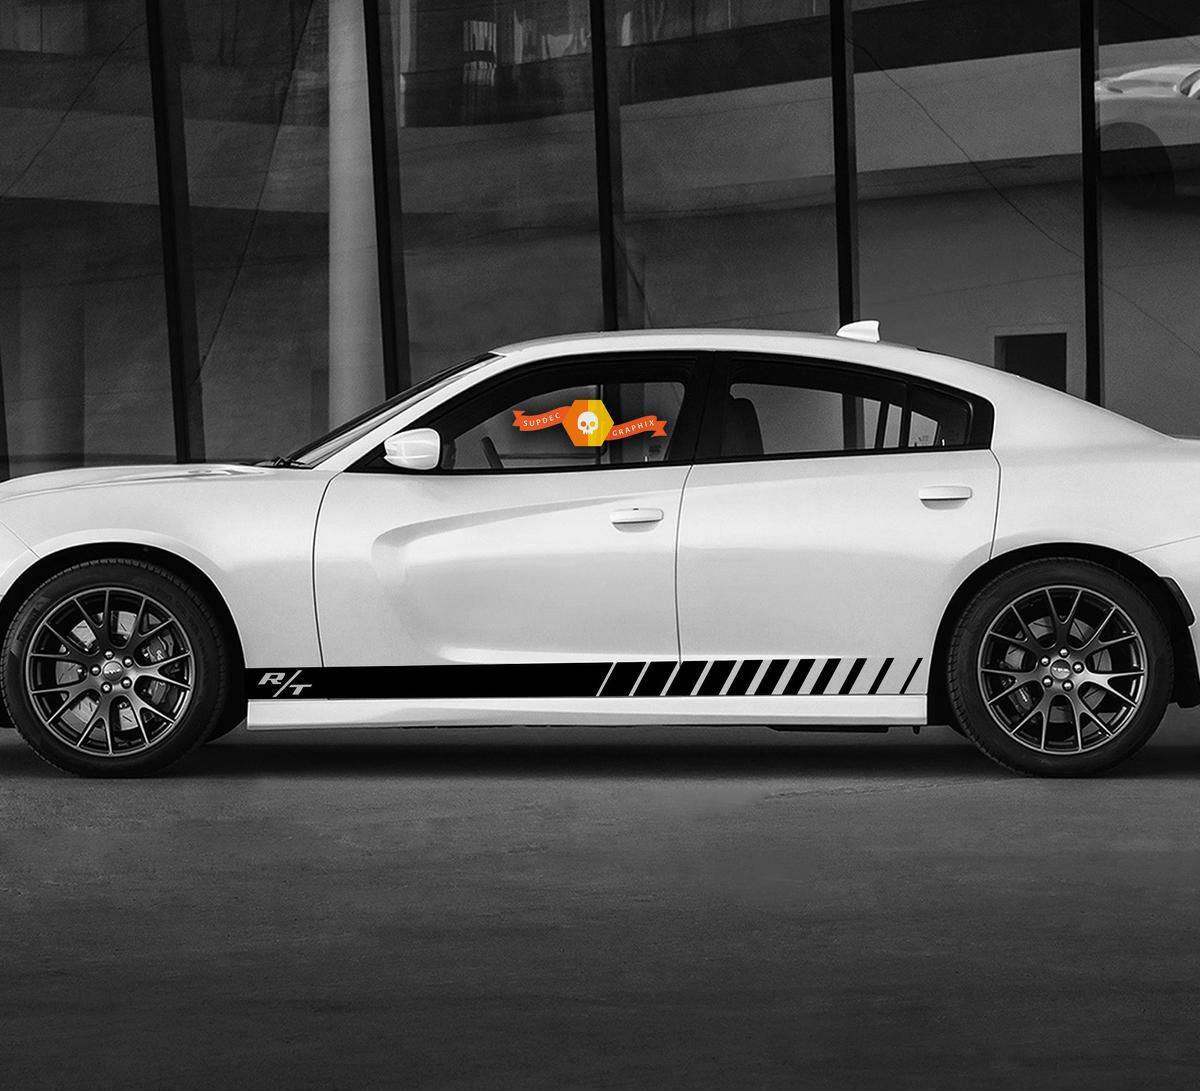 Dodge Charger Standard Streifen Rocker Rocker Seitenband Aufkleber Aufkleber für Hemi Daytona RT GT Mopar Grafiken